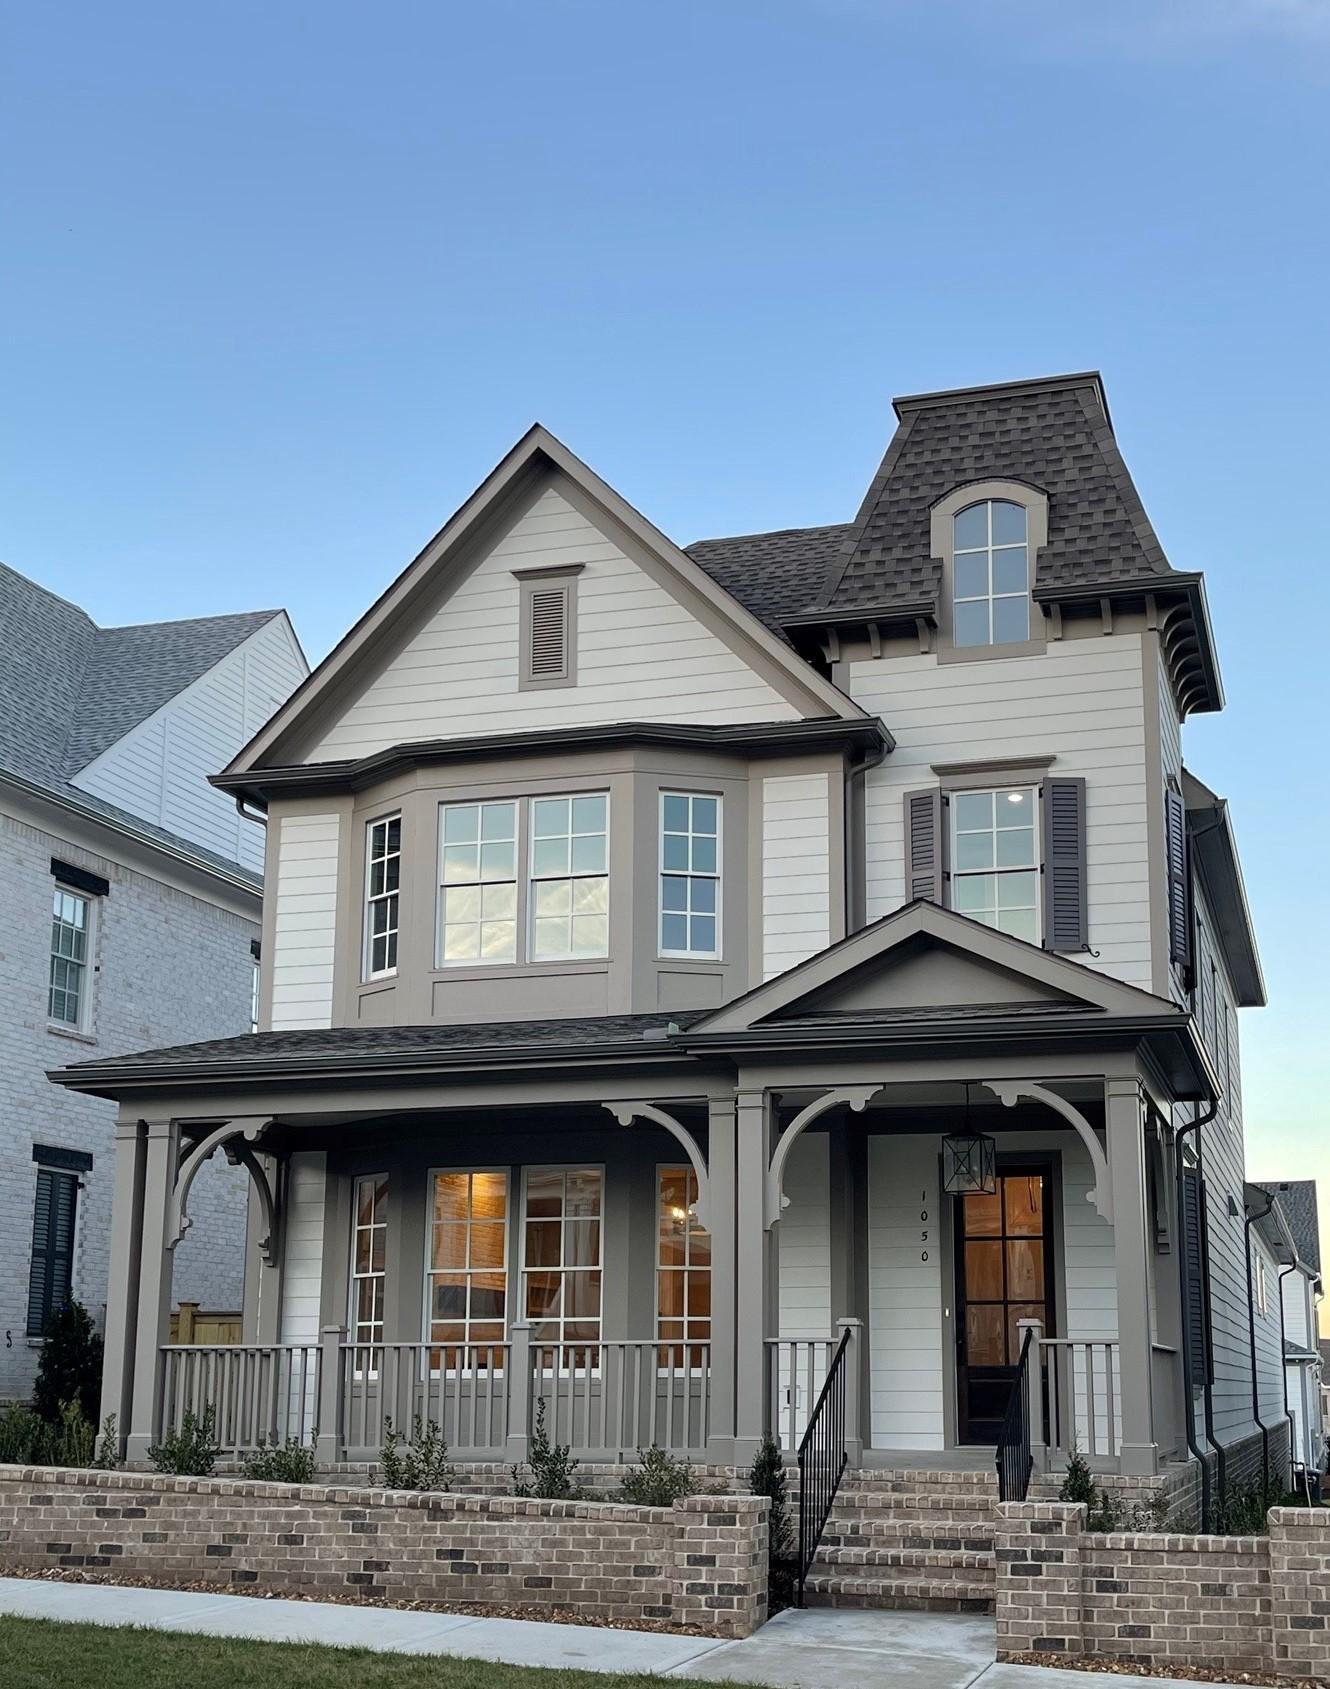 1050 Calico Street, Wh # 2095 Property Photo